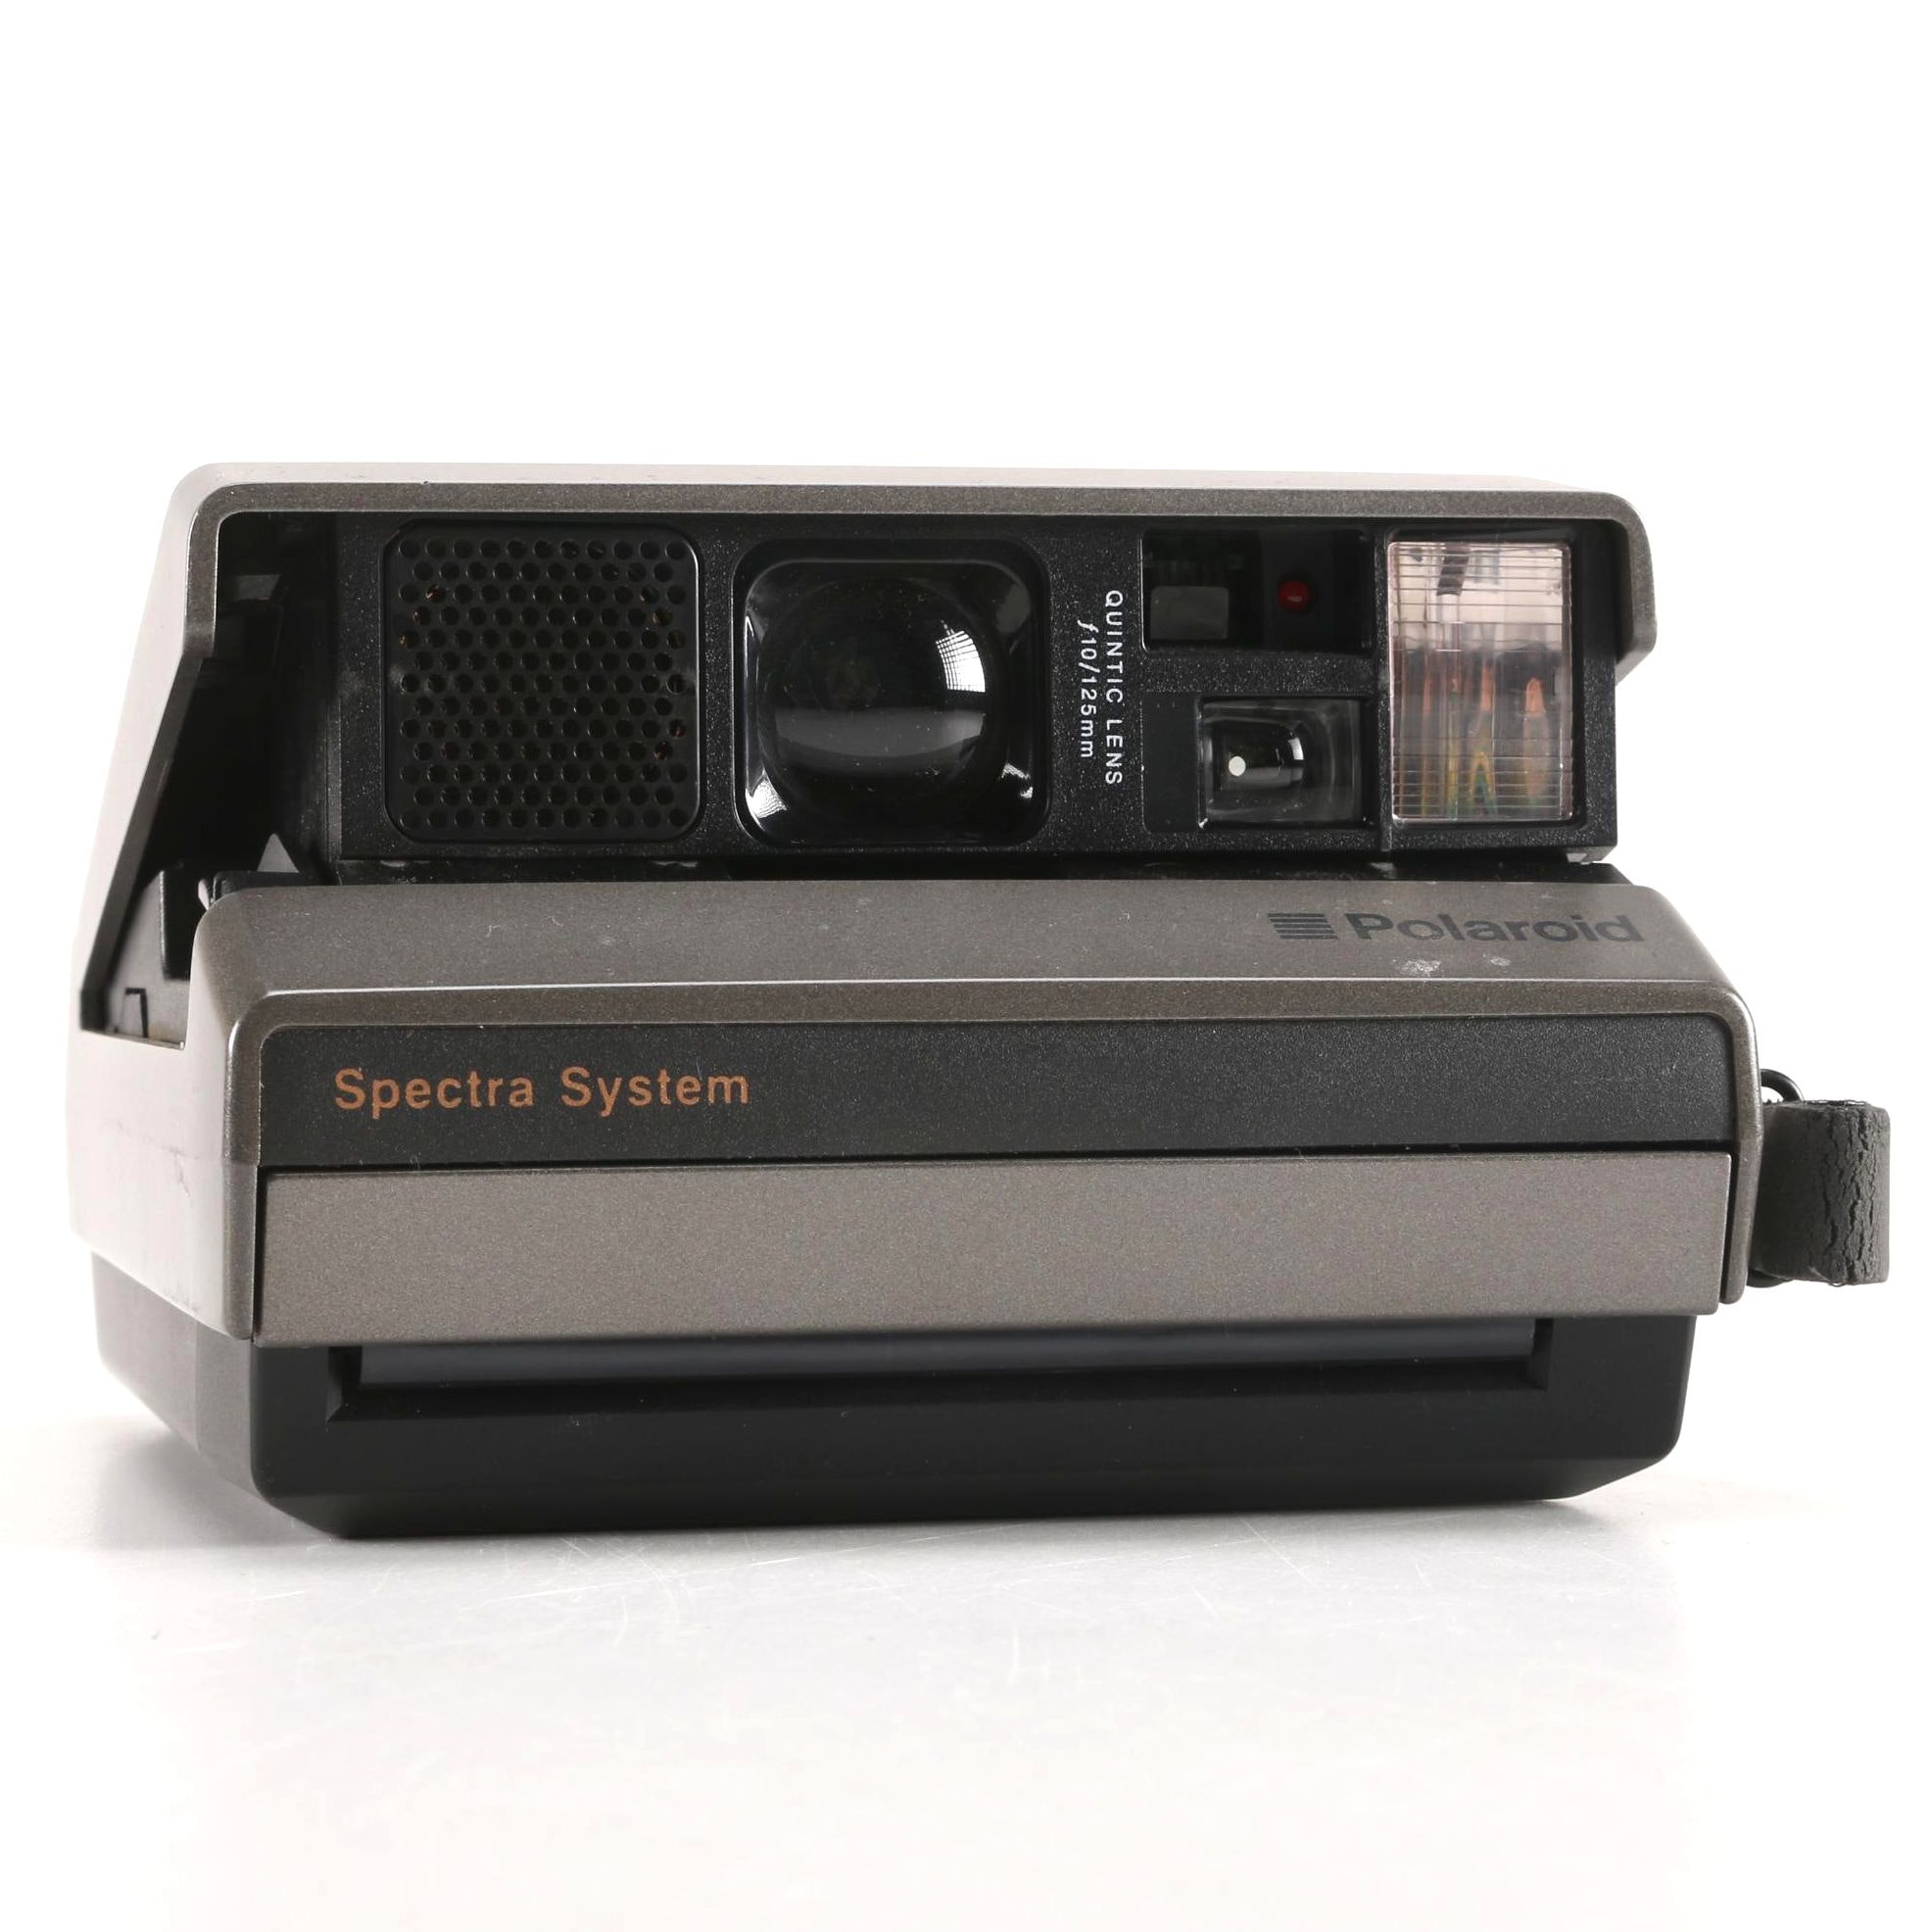 Polaroid Spectra System Camera